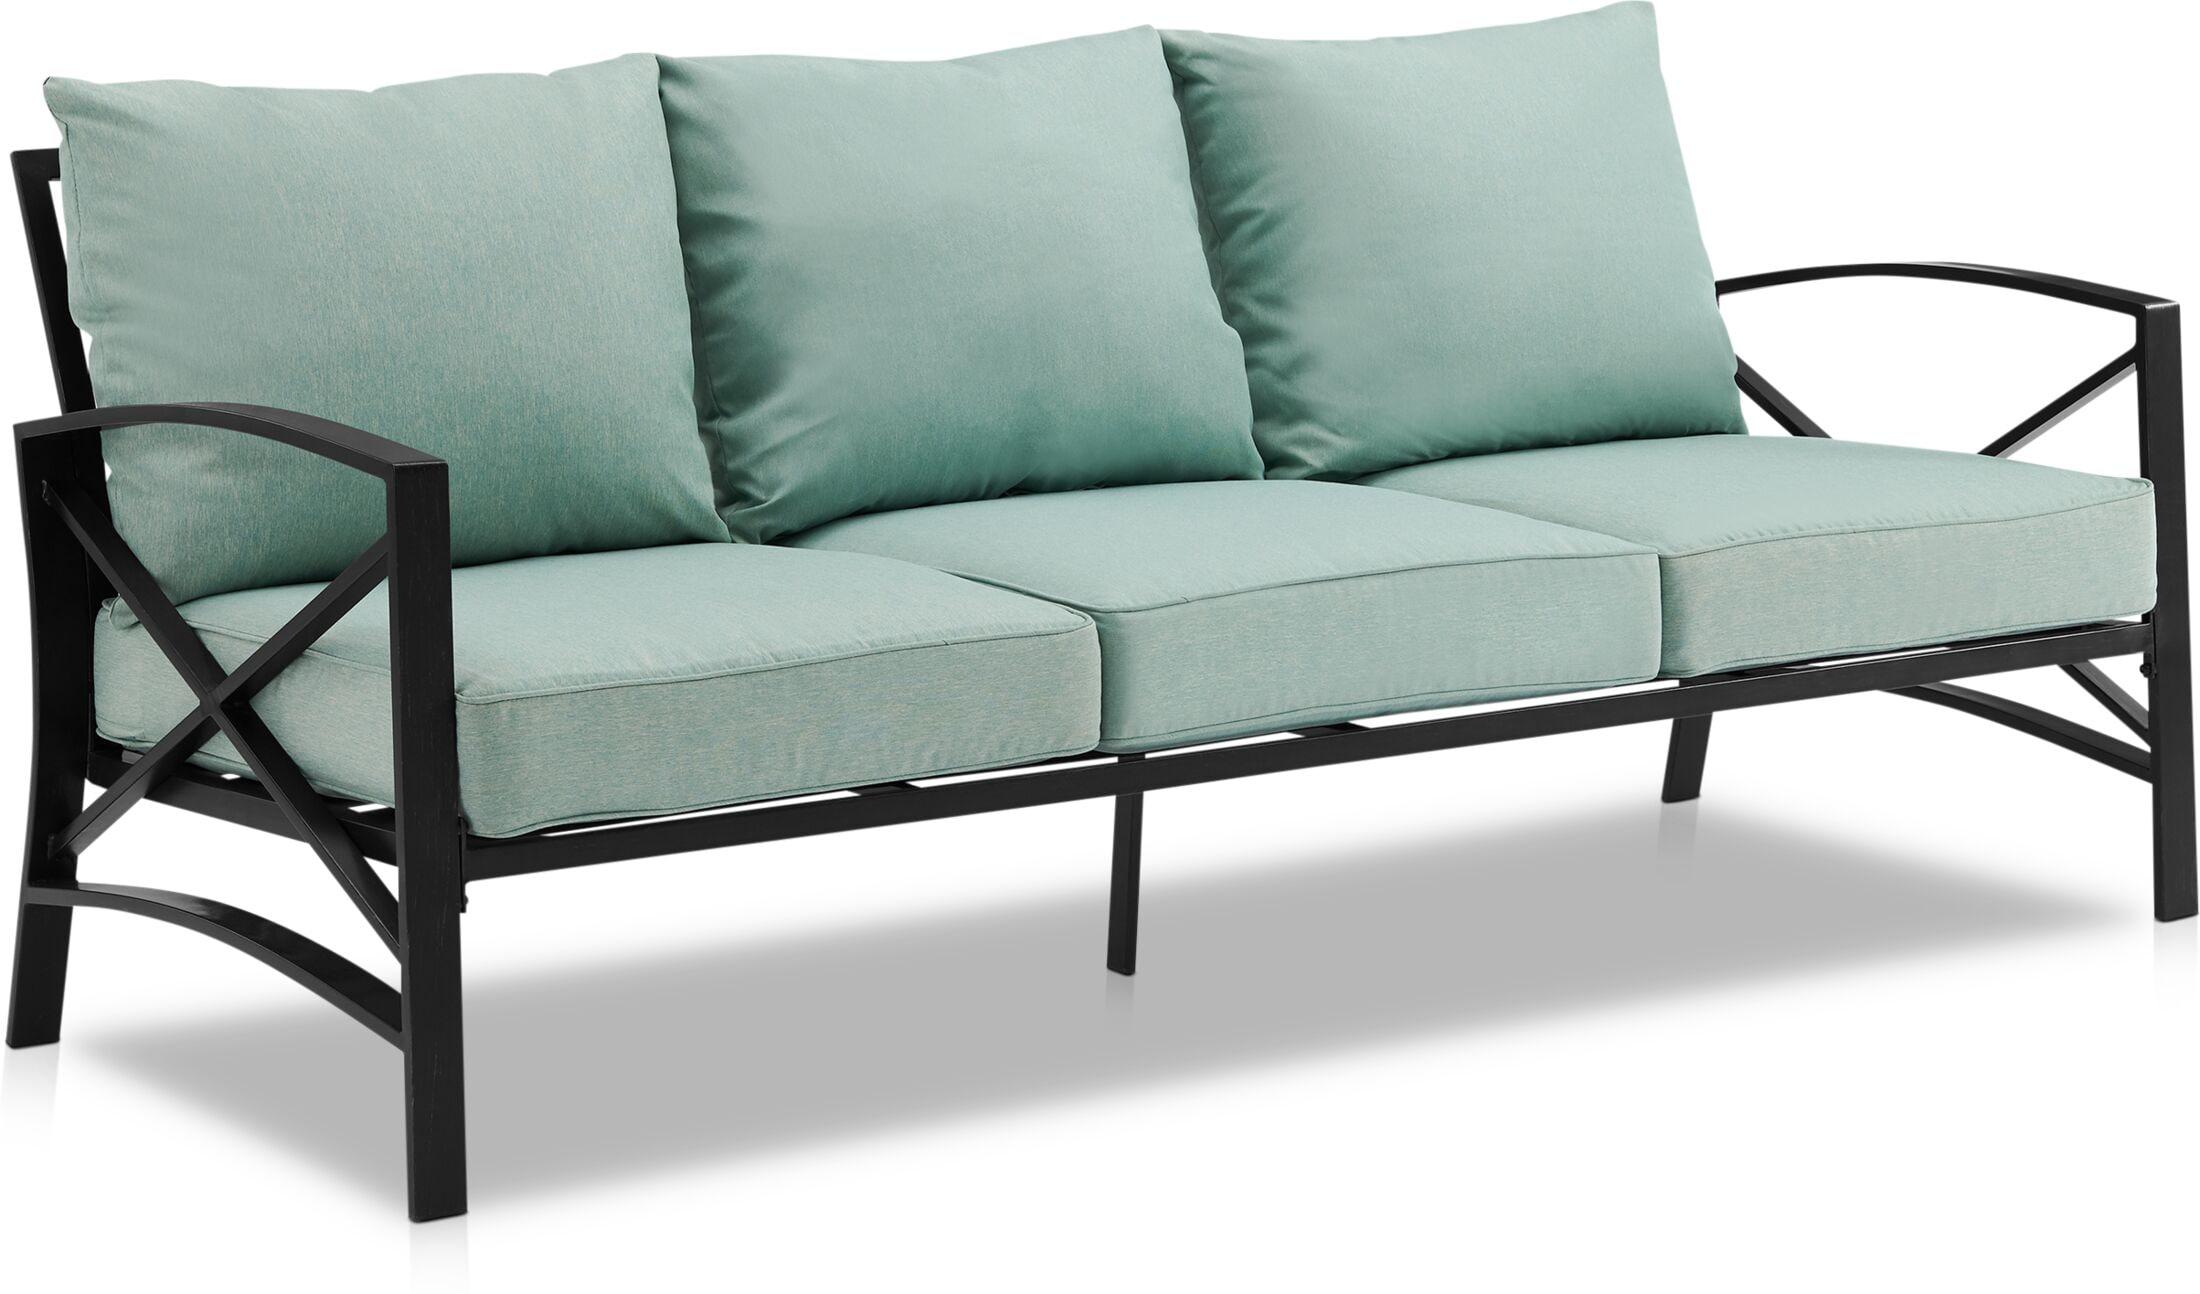 Outdoor Furniture - Clarion Outdoor Sofa